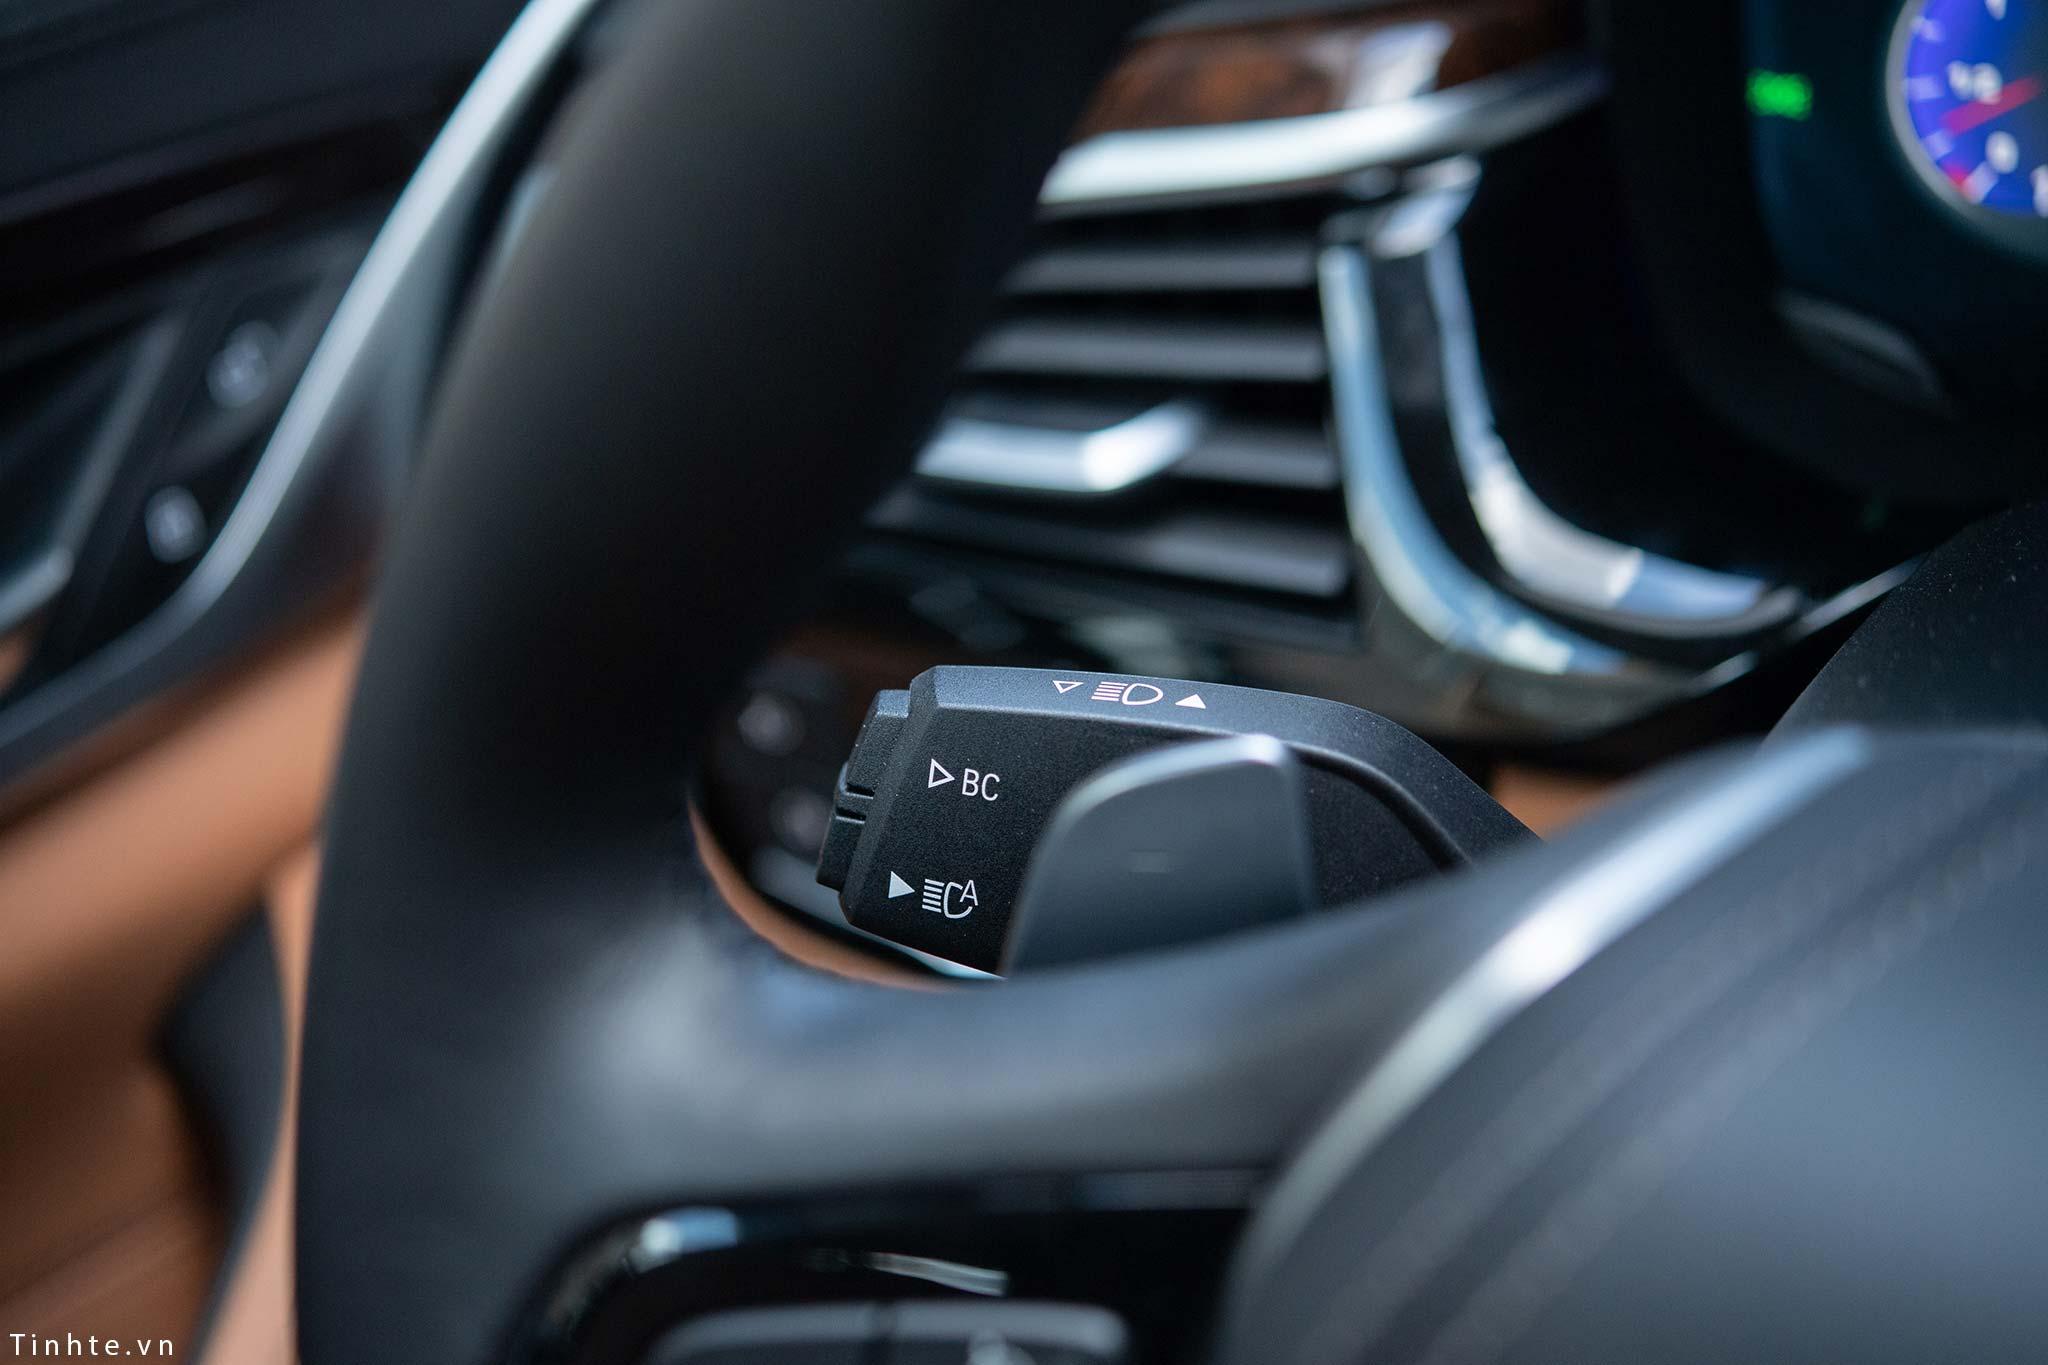 BMW_530i_G30_tinhte_25.jpg